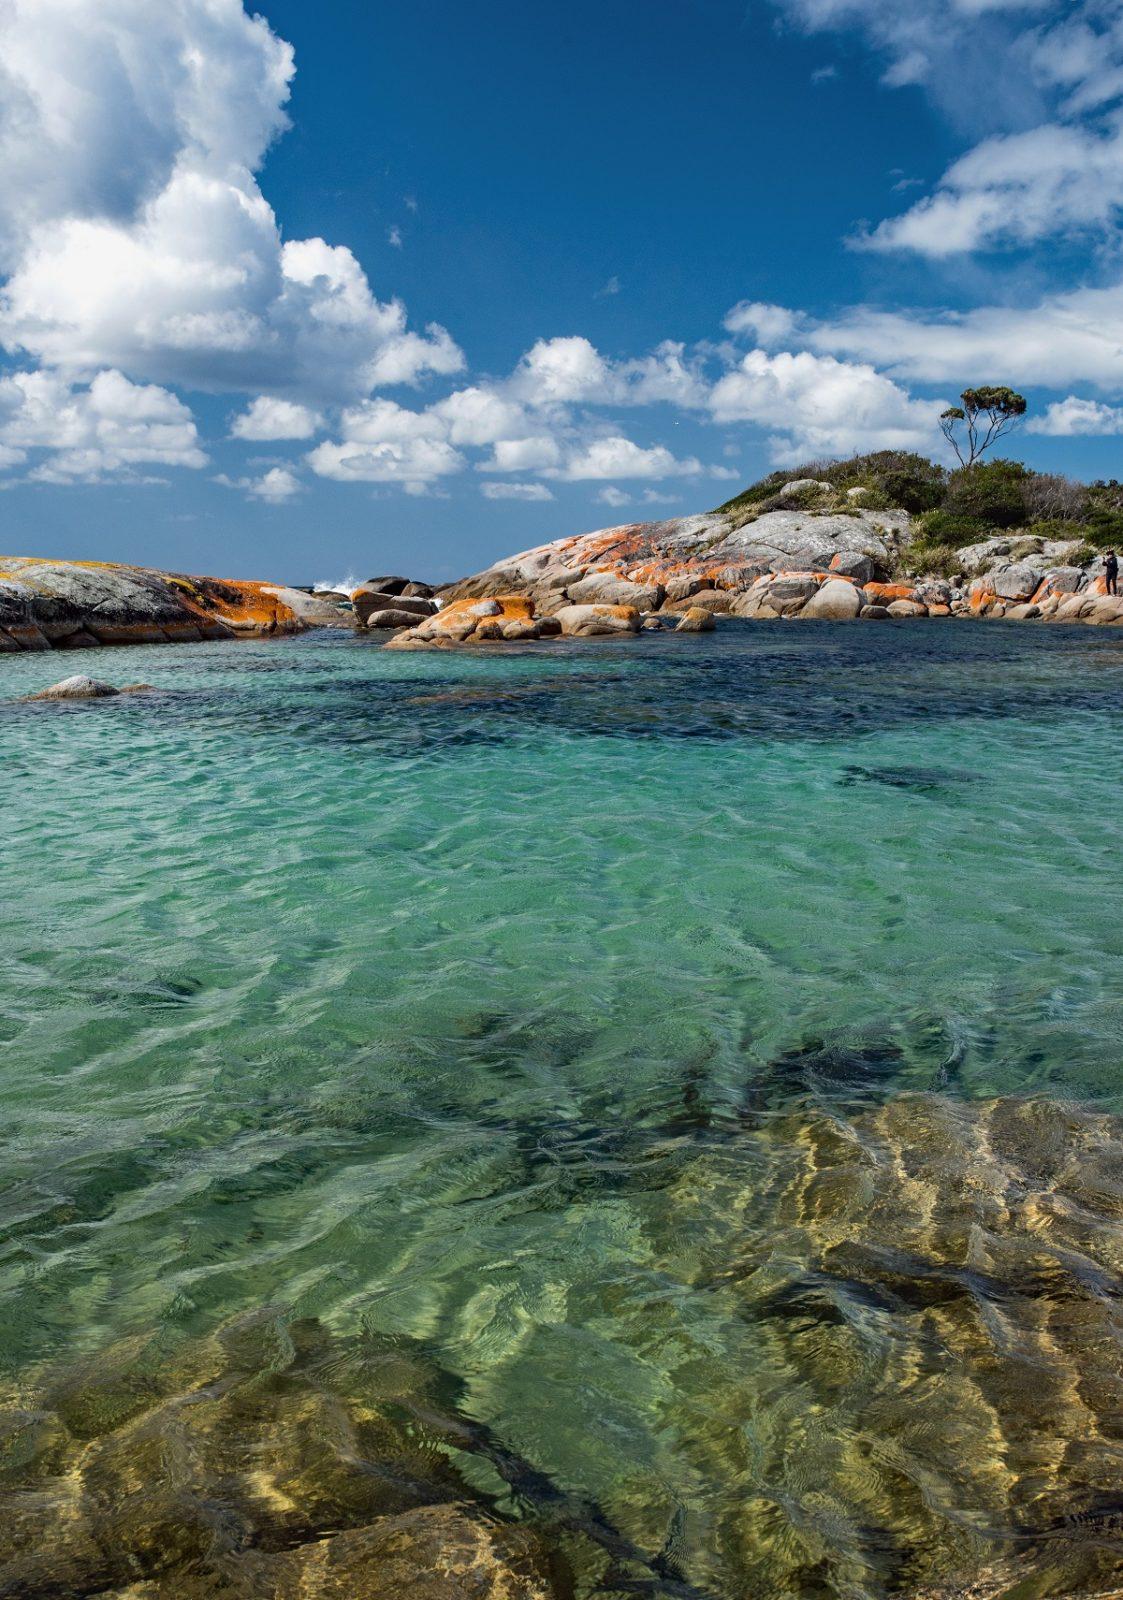 Залив Биналонг в Австралии на острове Тасмания во время прилива